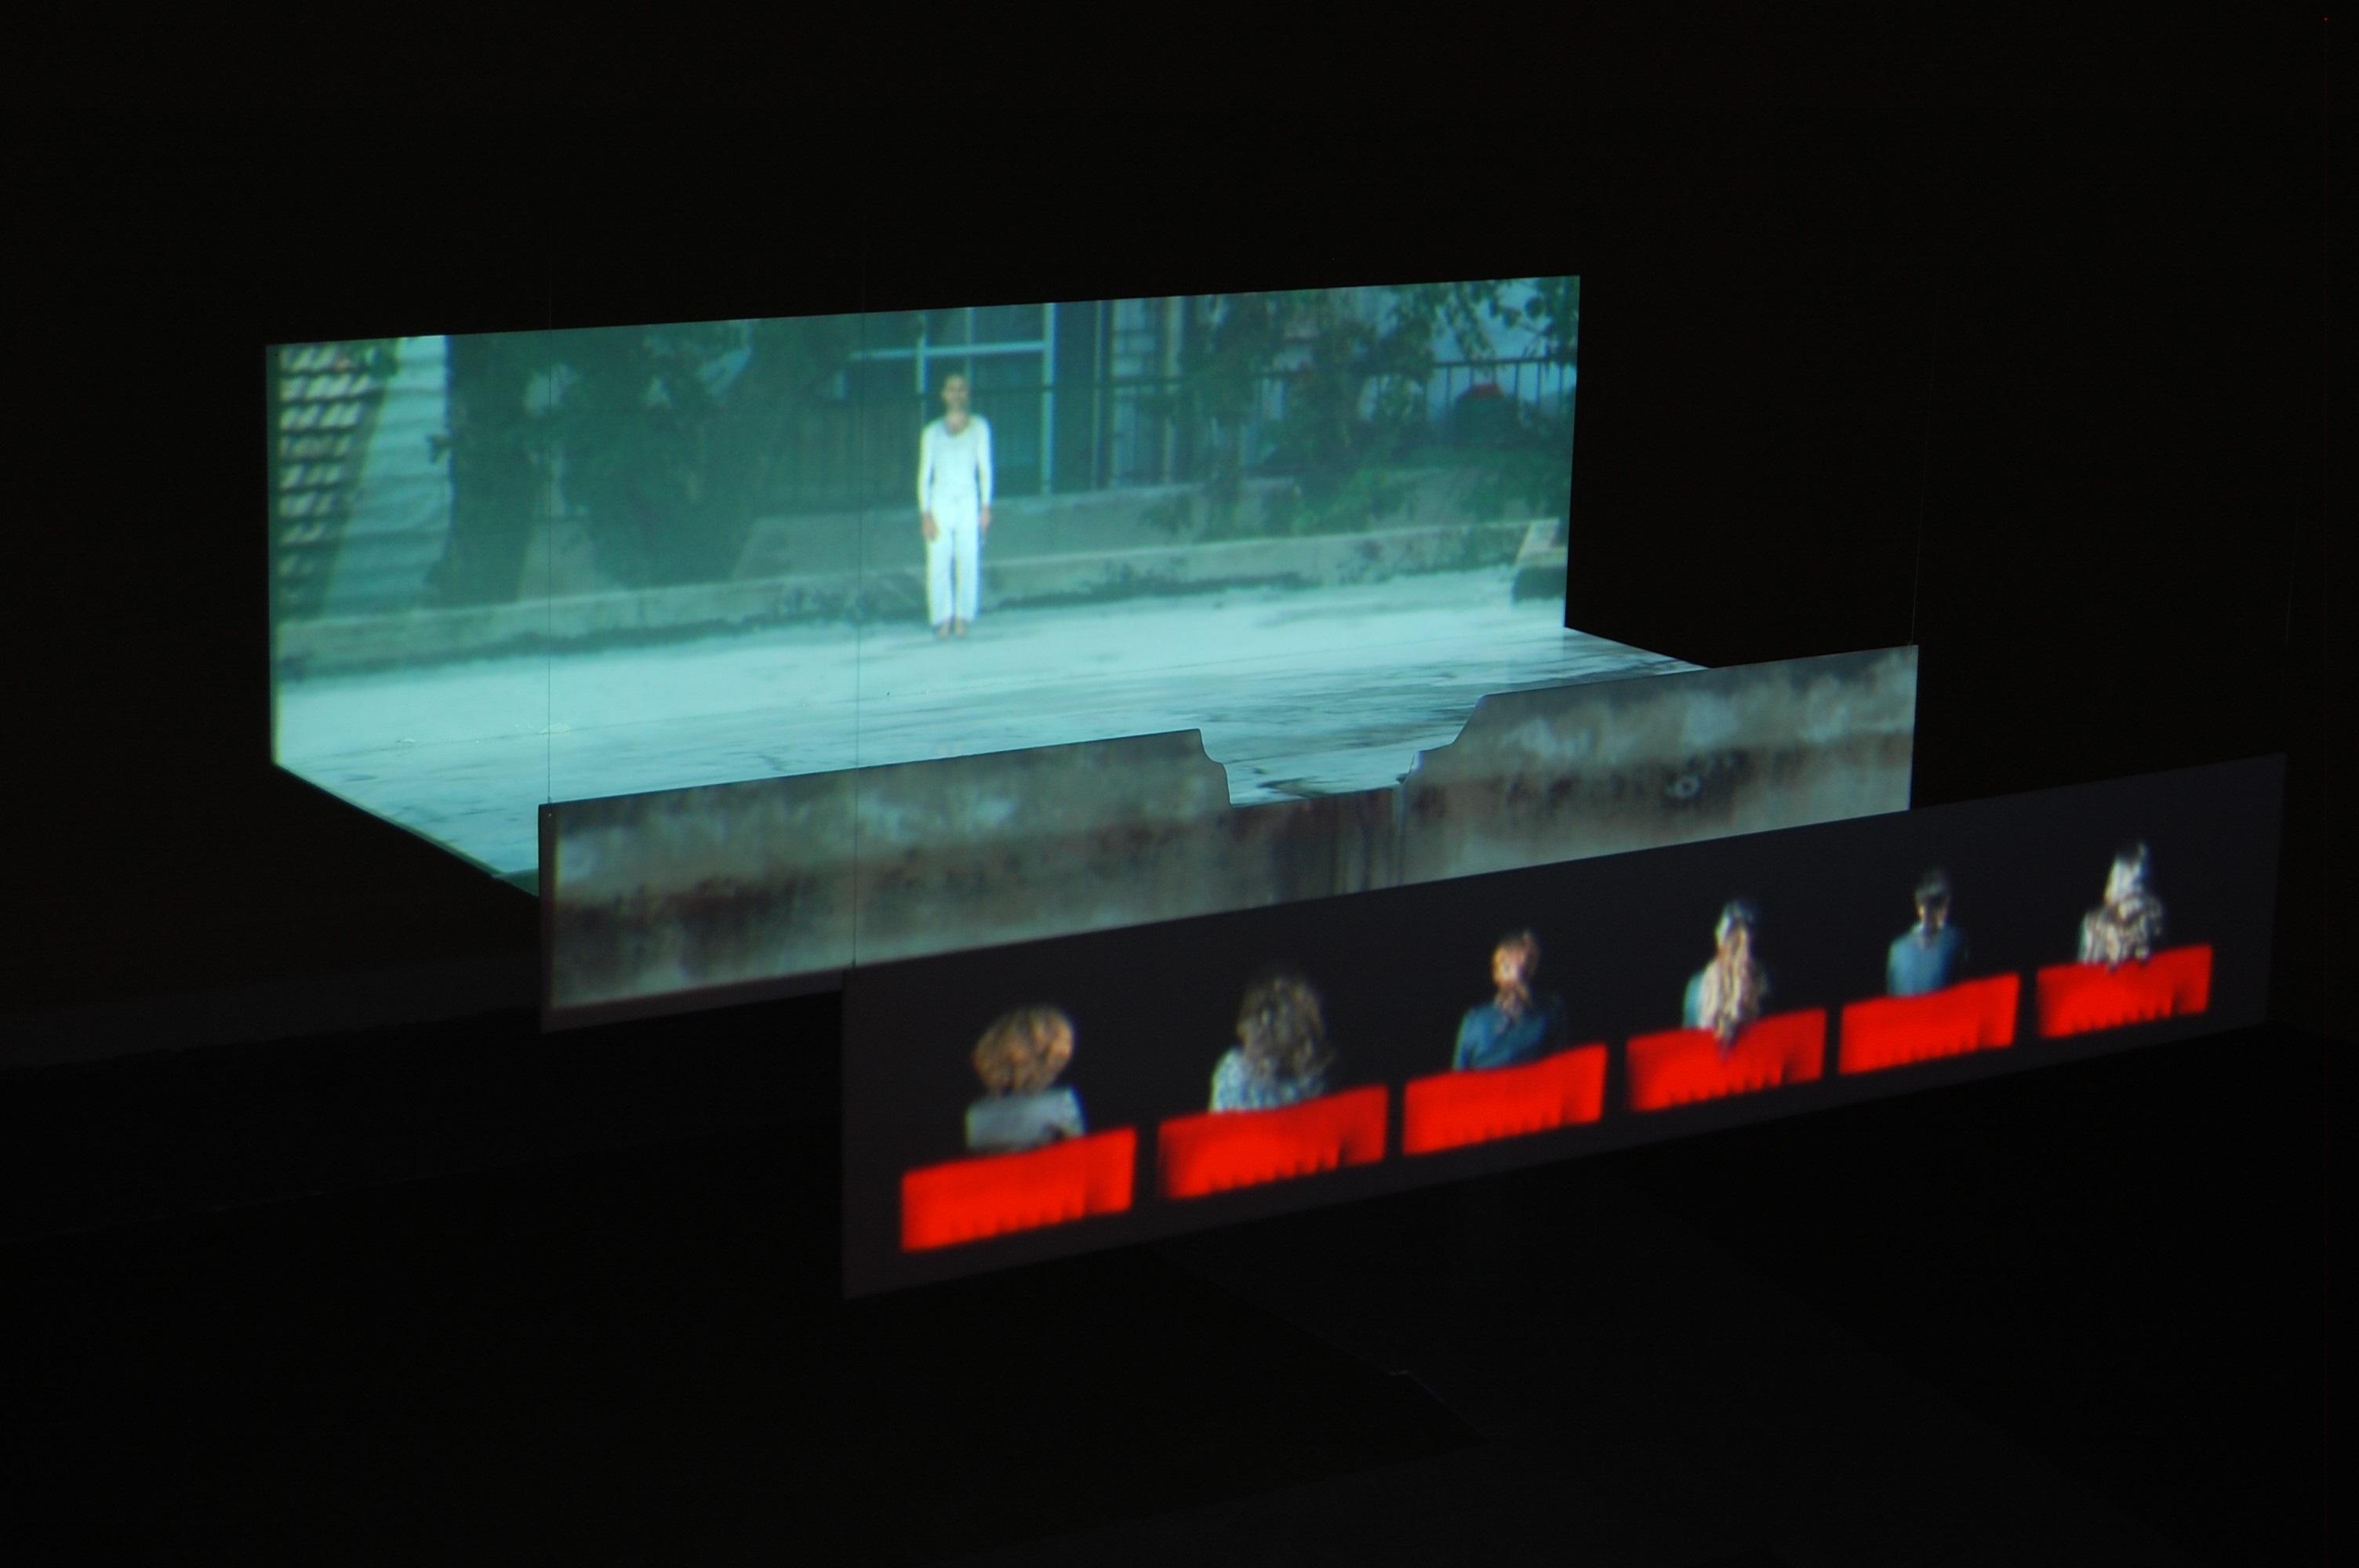 Michel Platnic, Self-portrait as a Warrior video installation, 0557